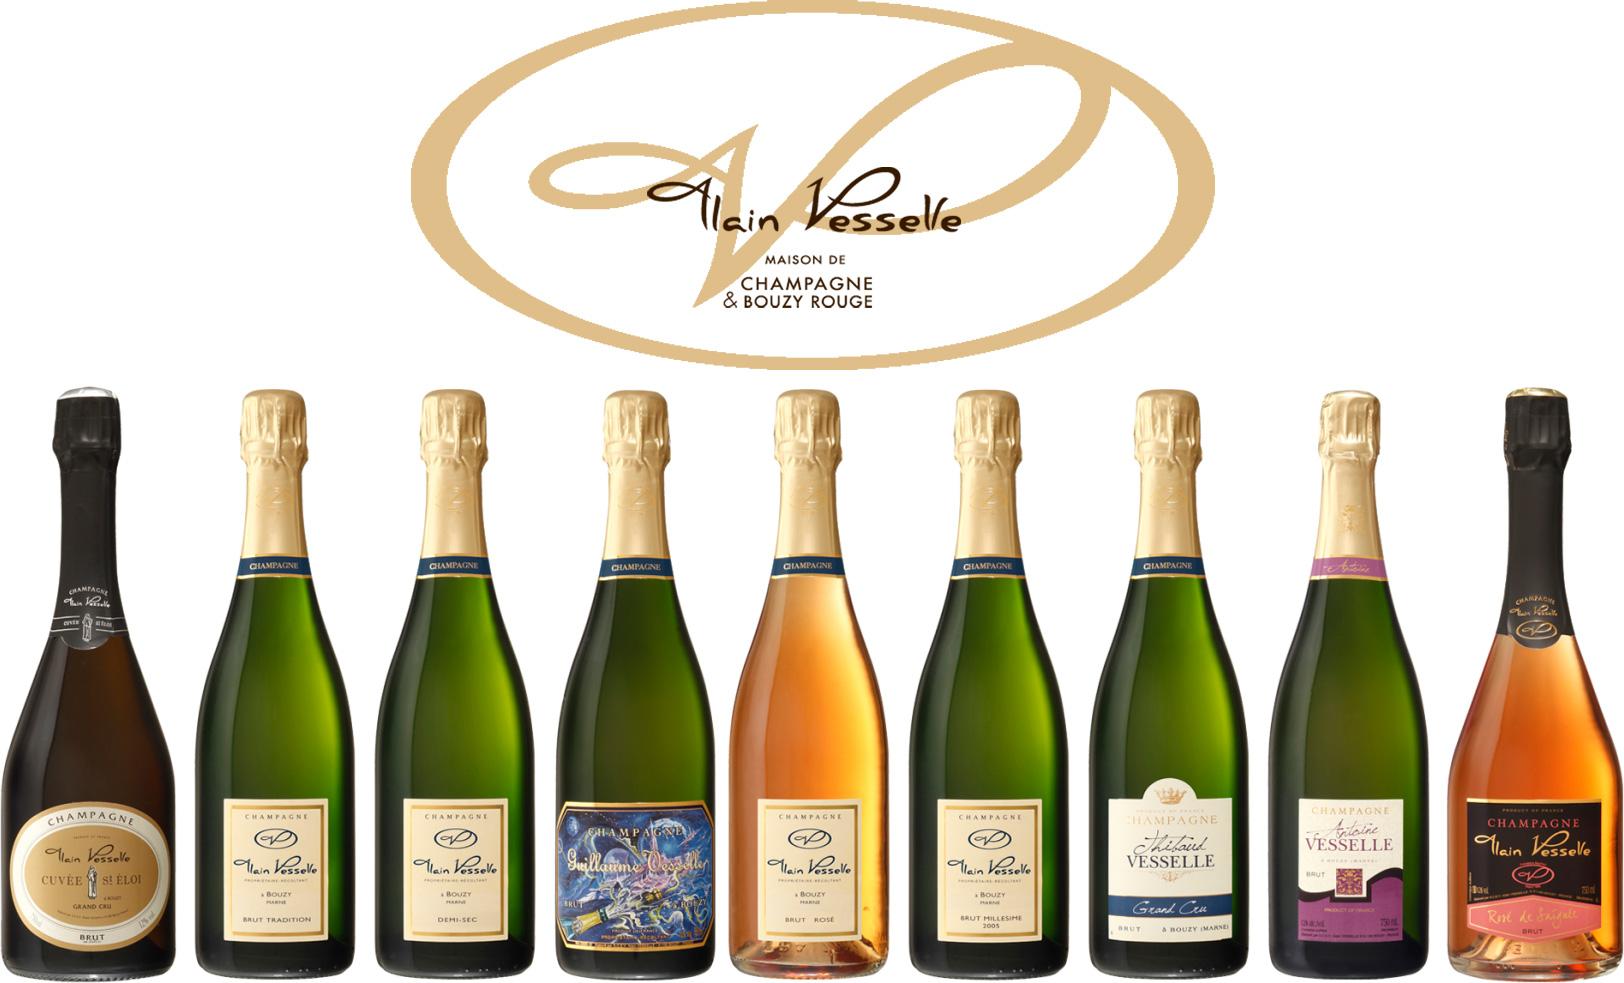 Champagne Alain Vesselle